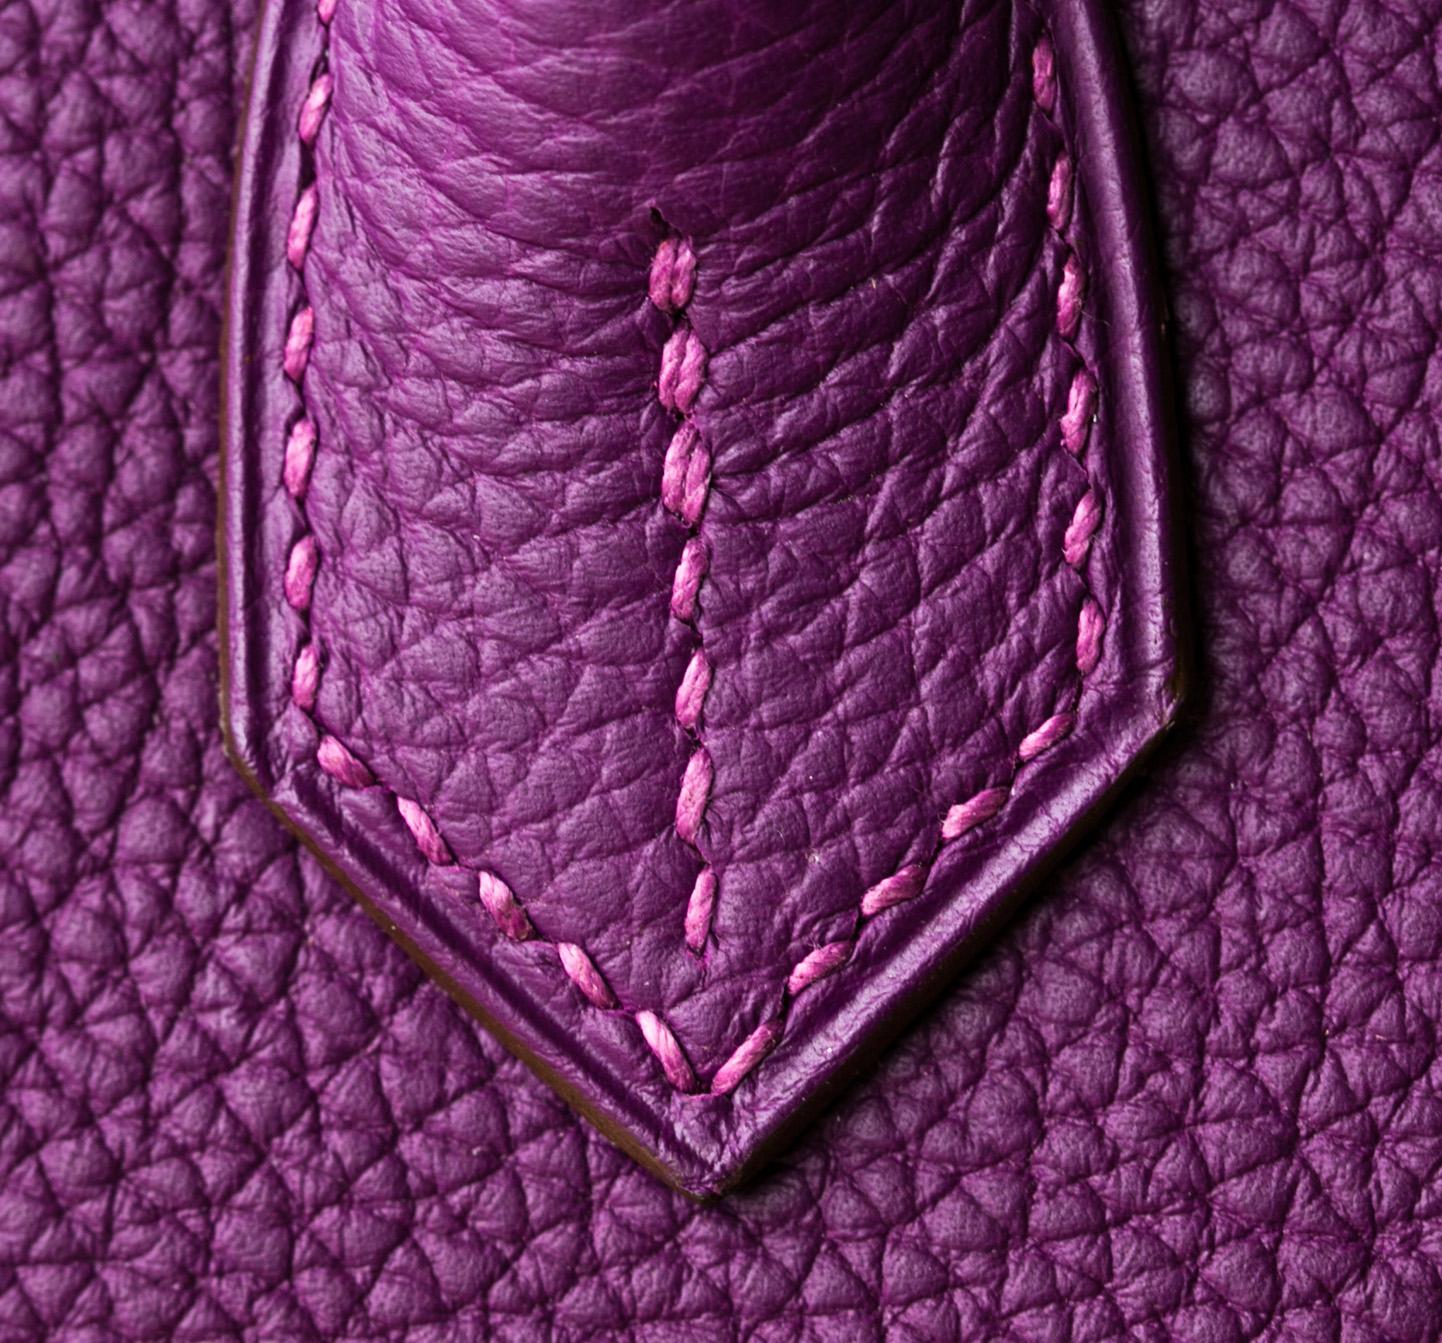 Hermes Birkin 25CM P9海葵紫 Togo皮 金扣银扣现货